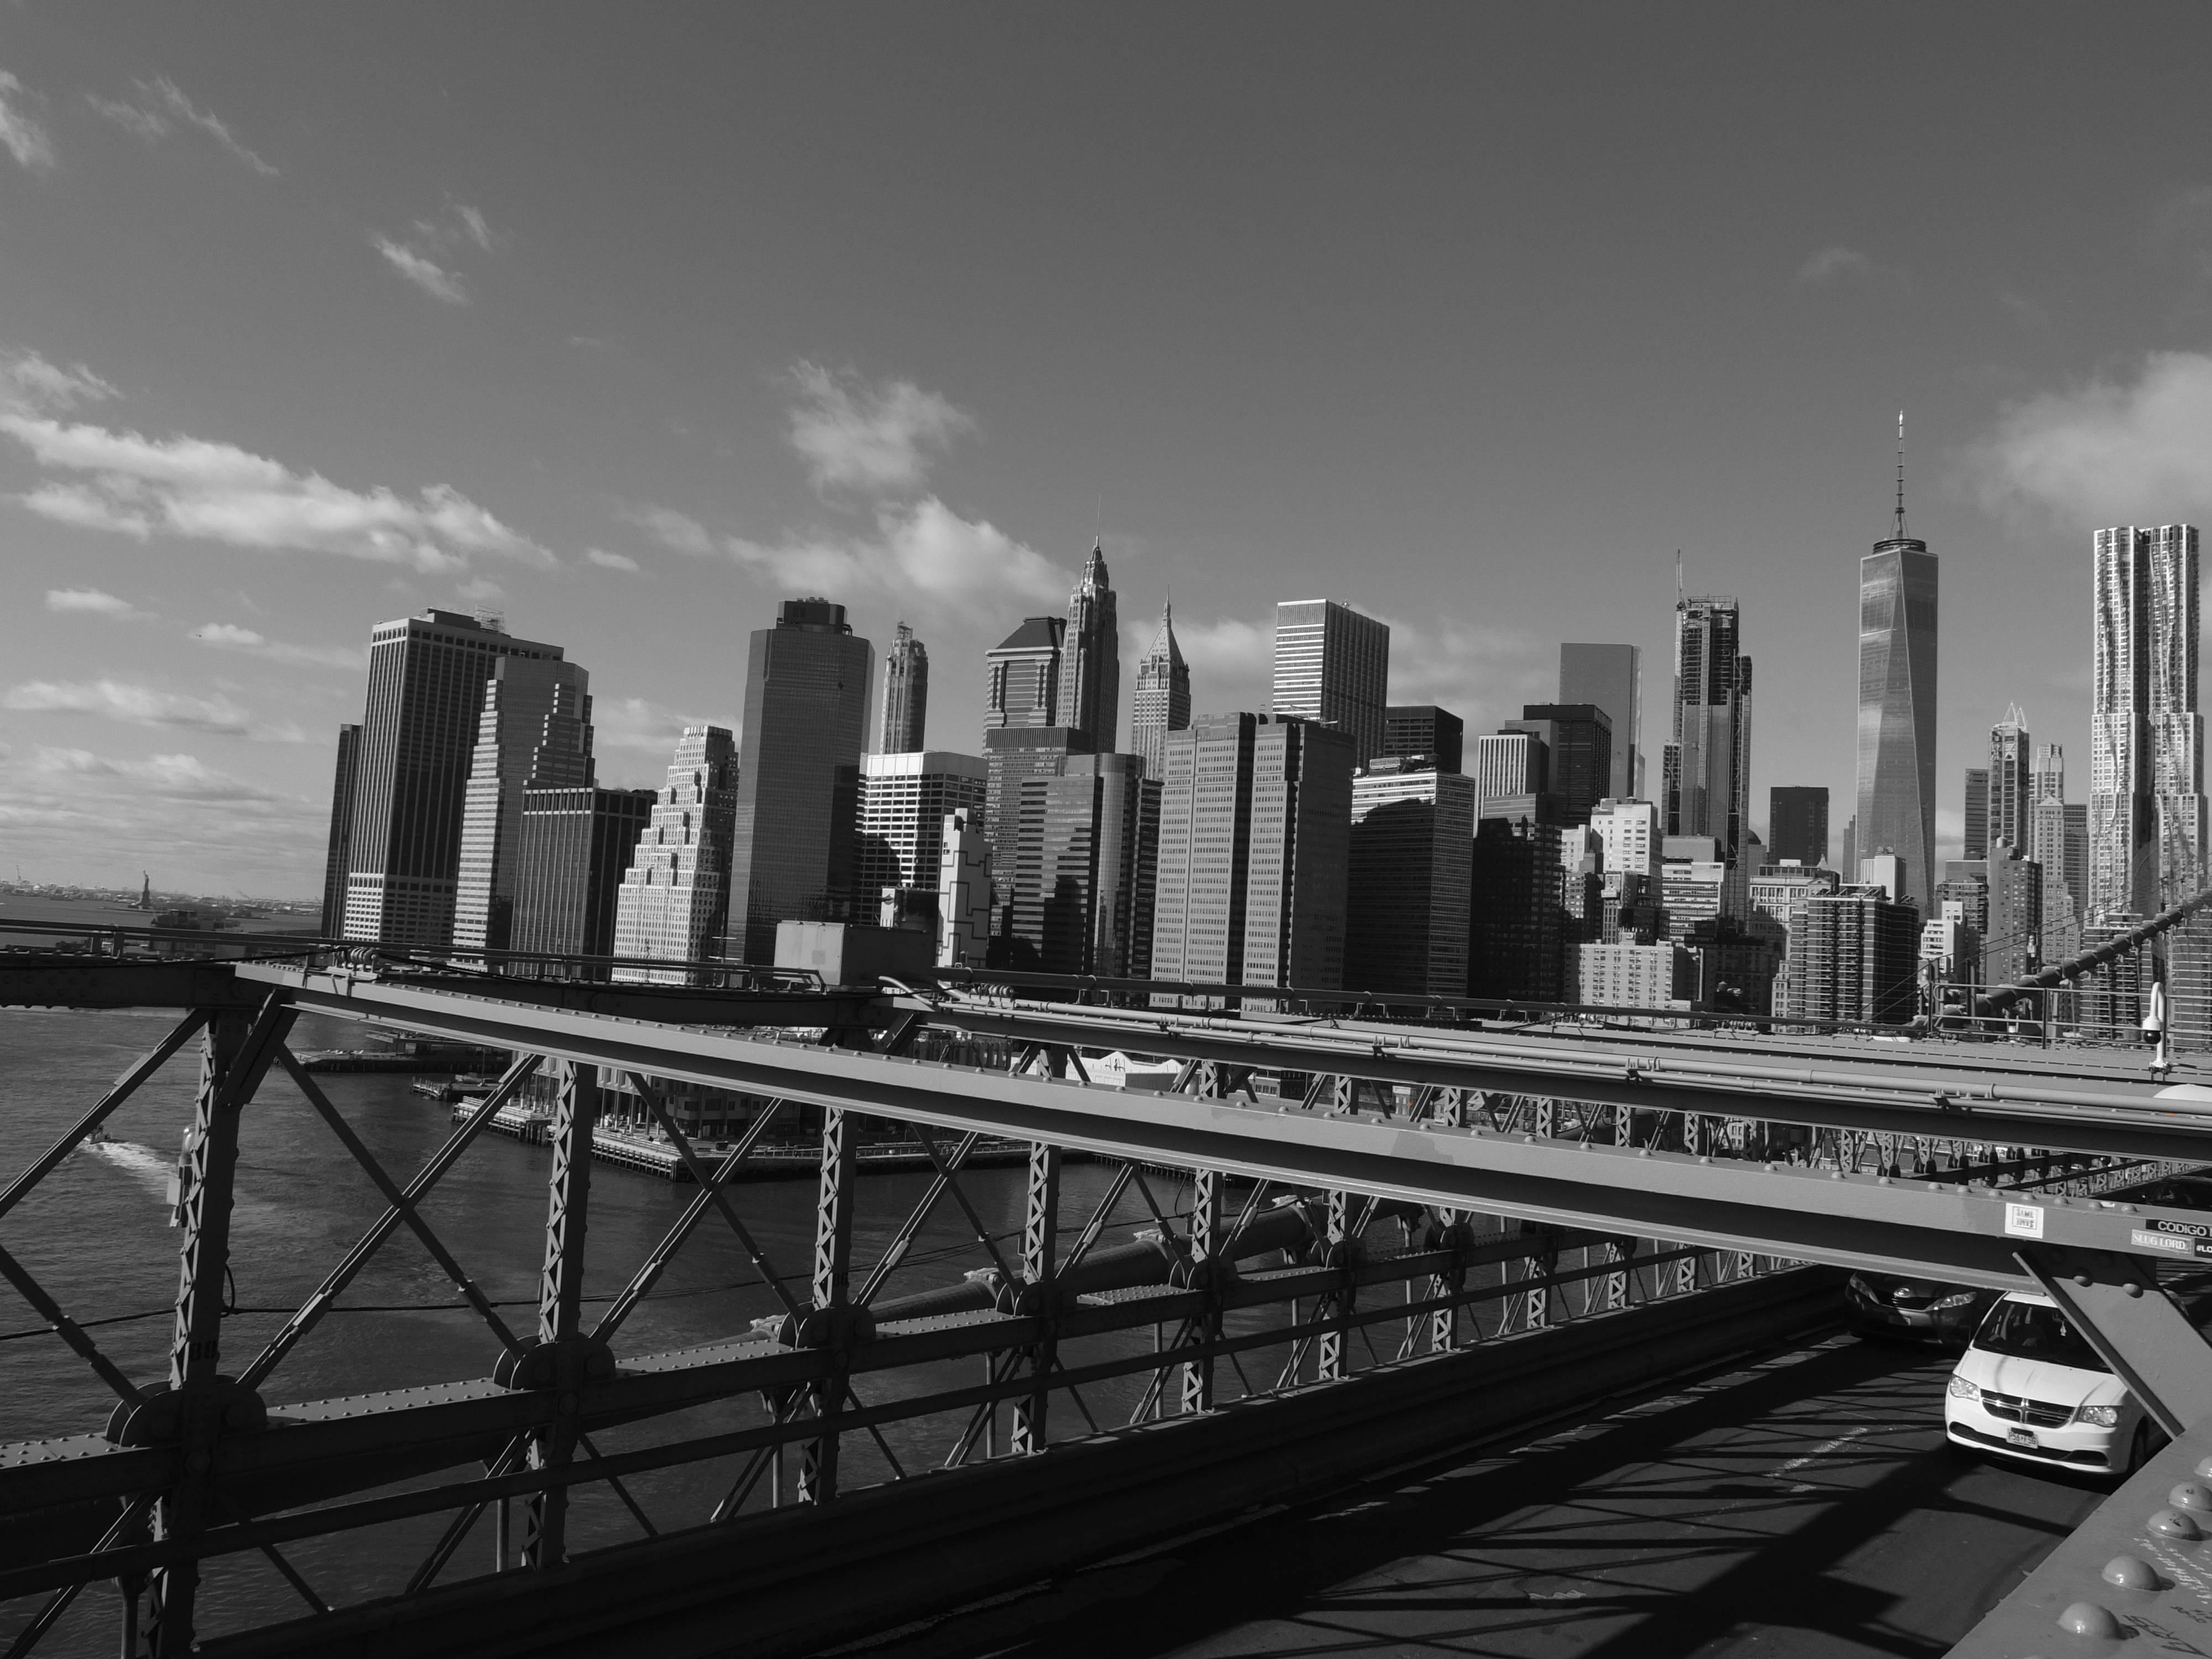 Photo 1: La traversée de Brooklyn Bridge, un classique qui en vaut le coup !